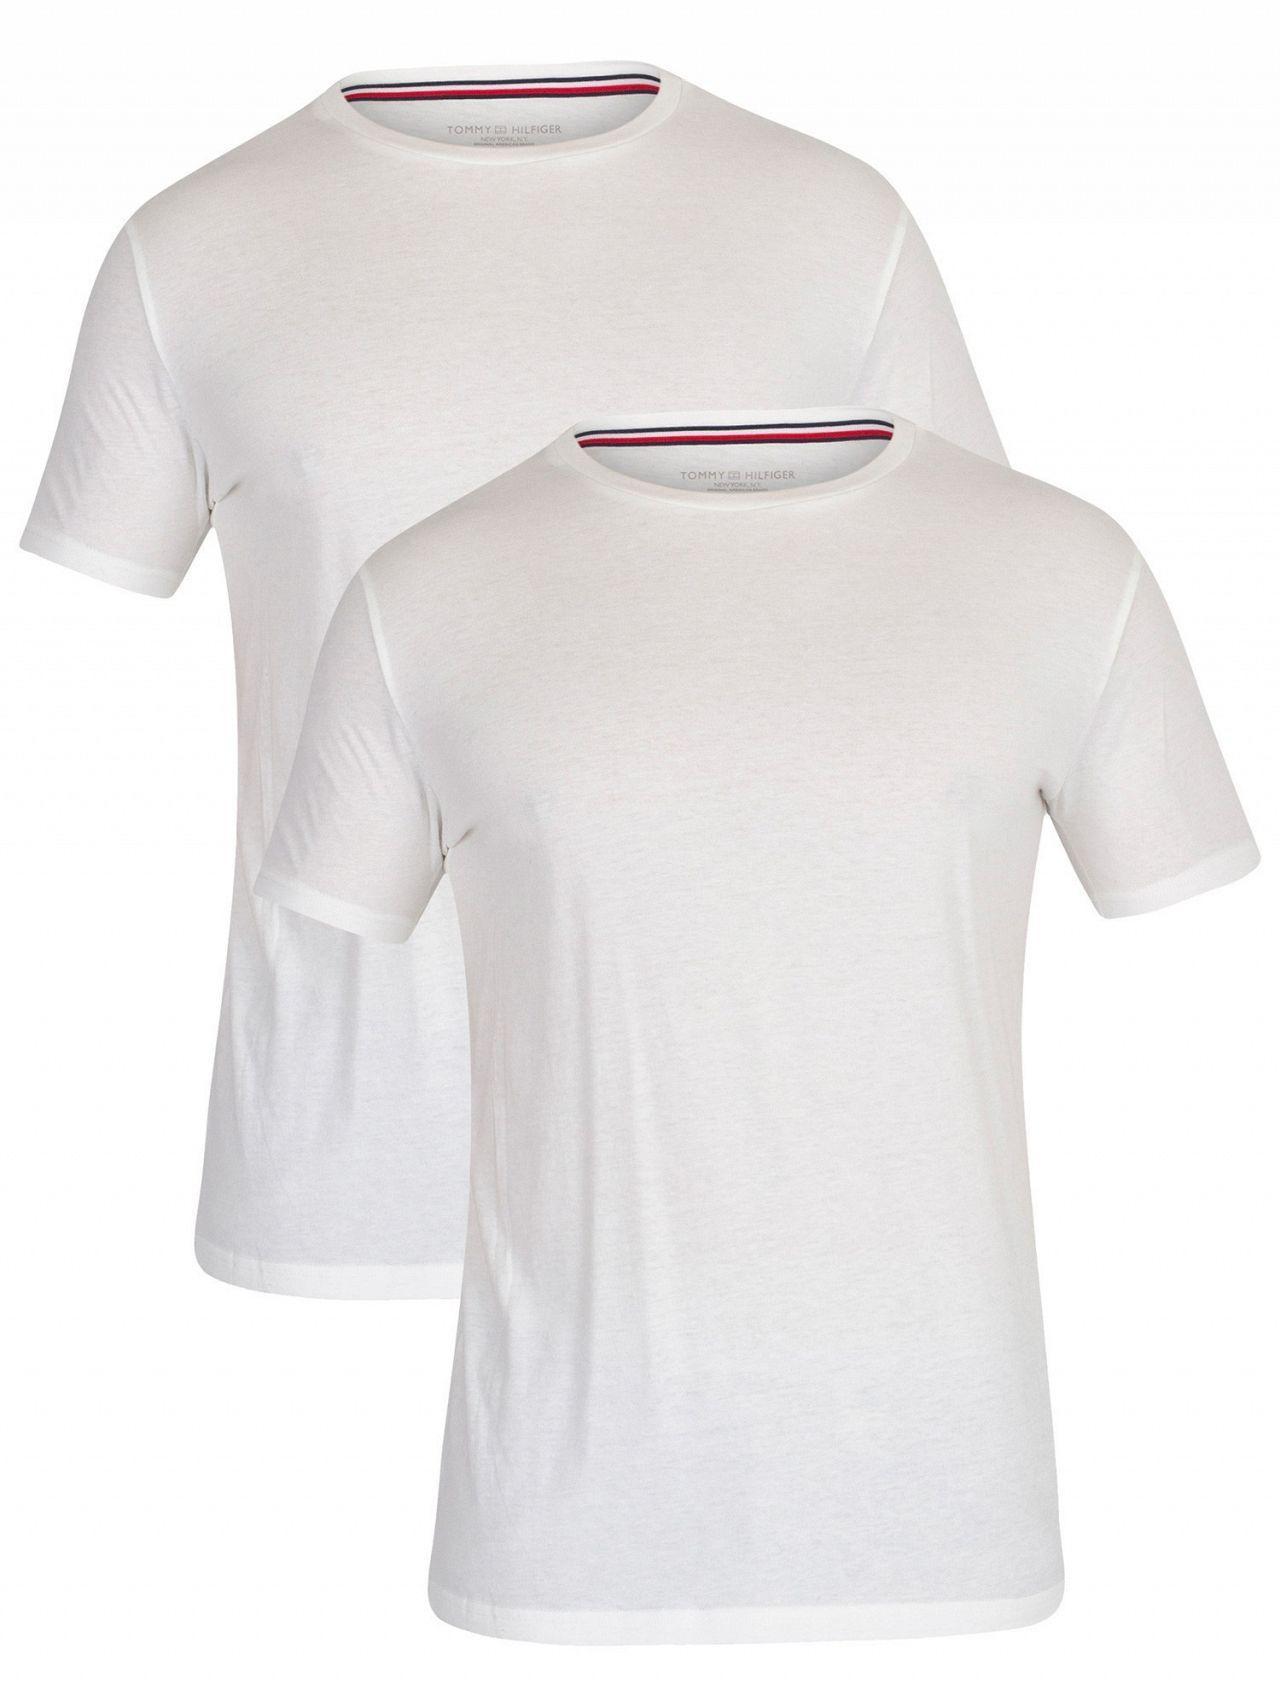 11fb8ecee11b Tommy Hilfiger - Men s 2 Pack Cotton T-shirts